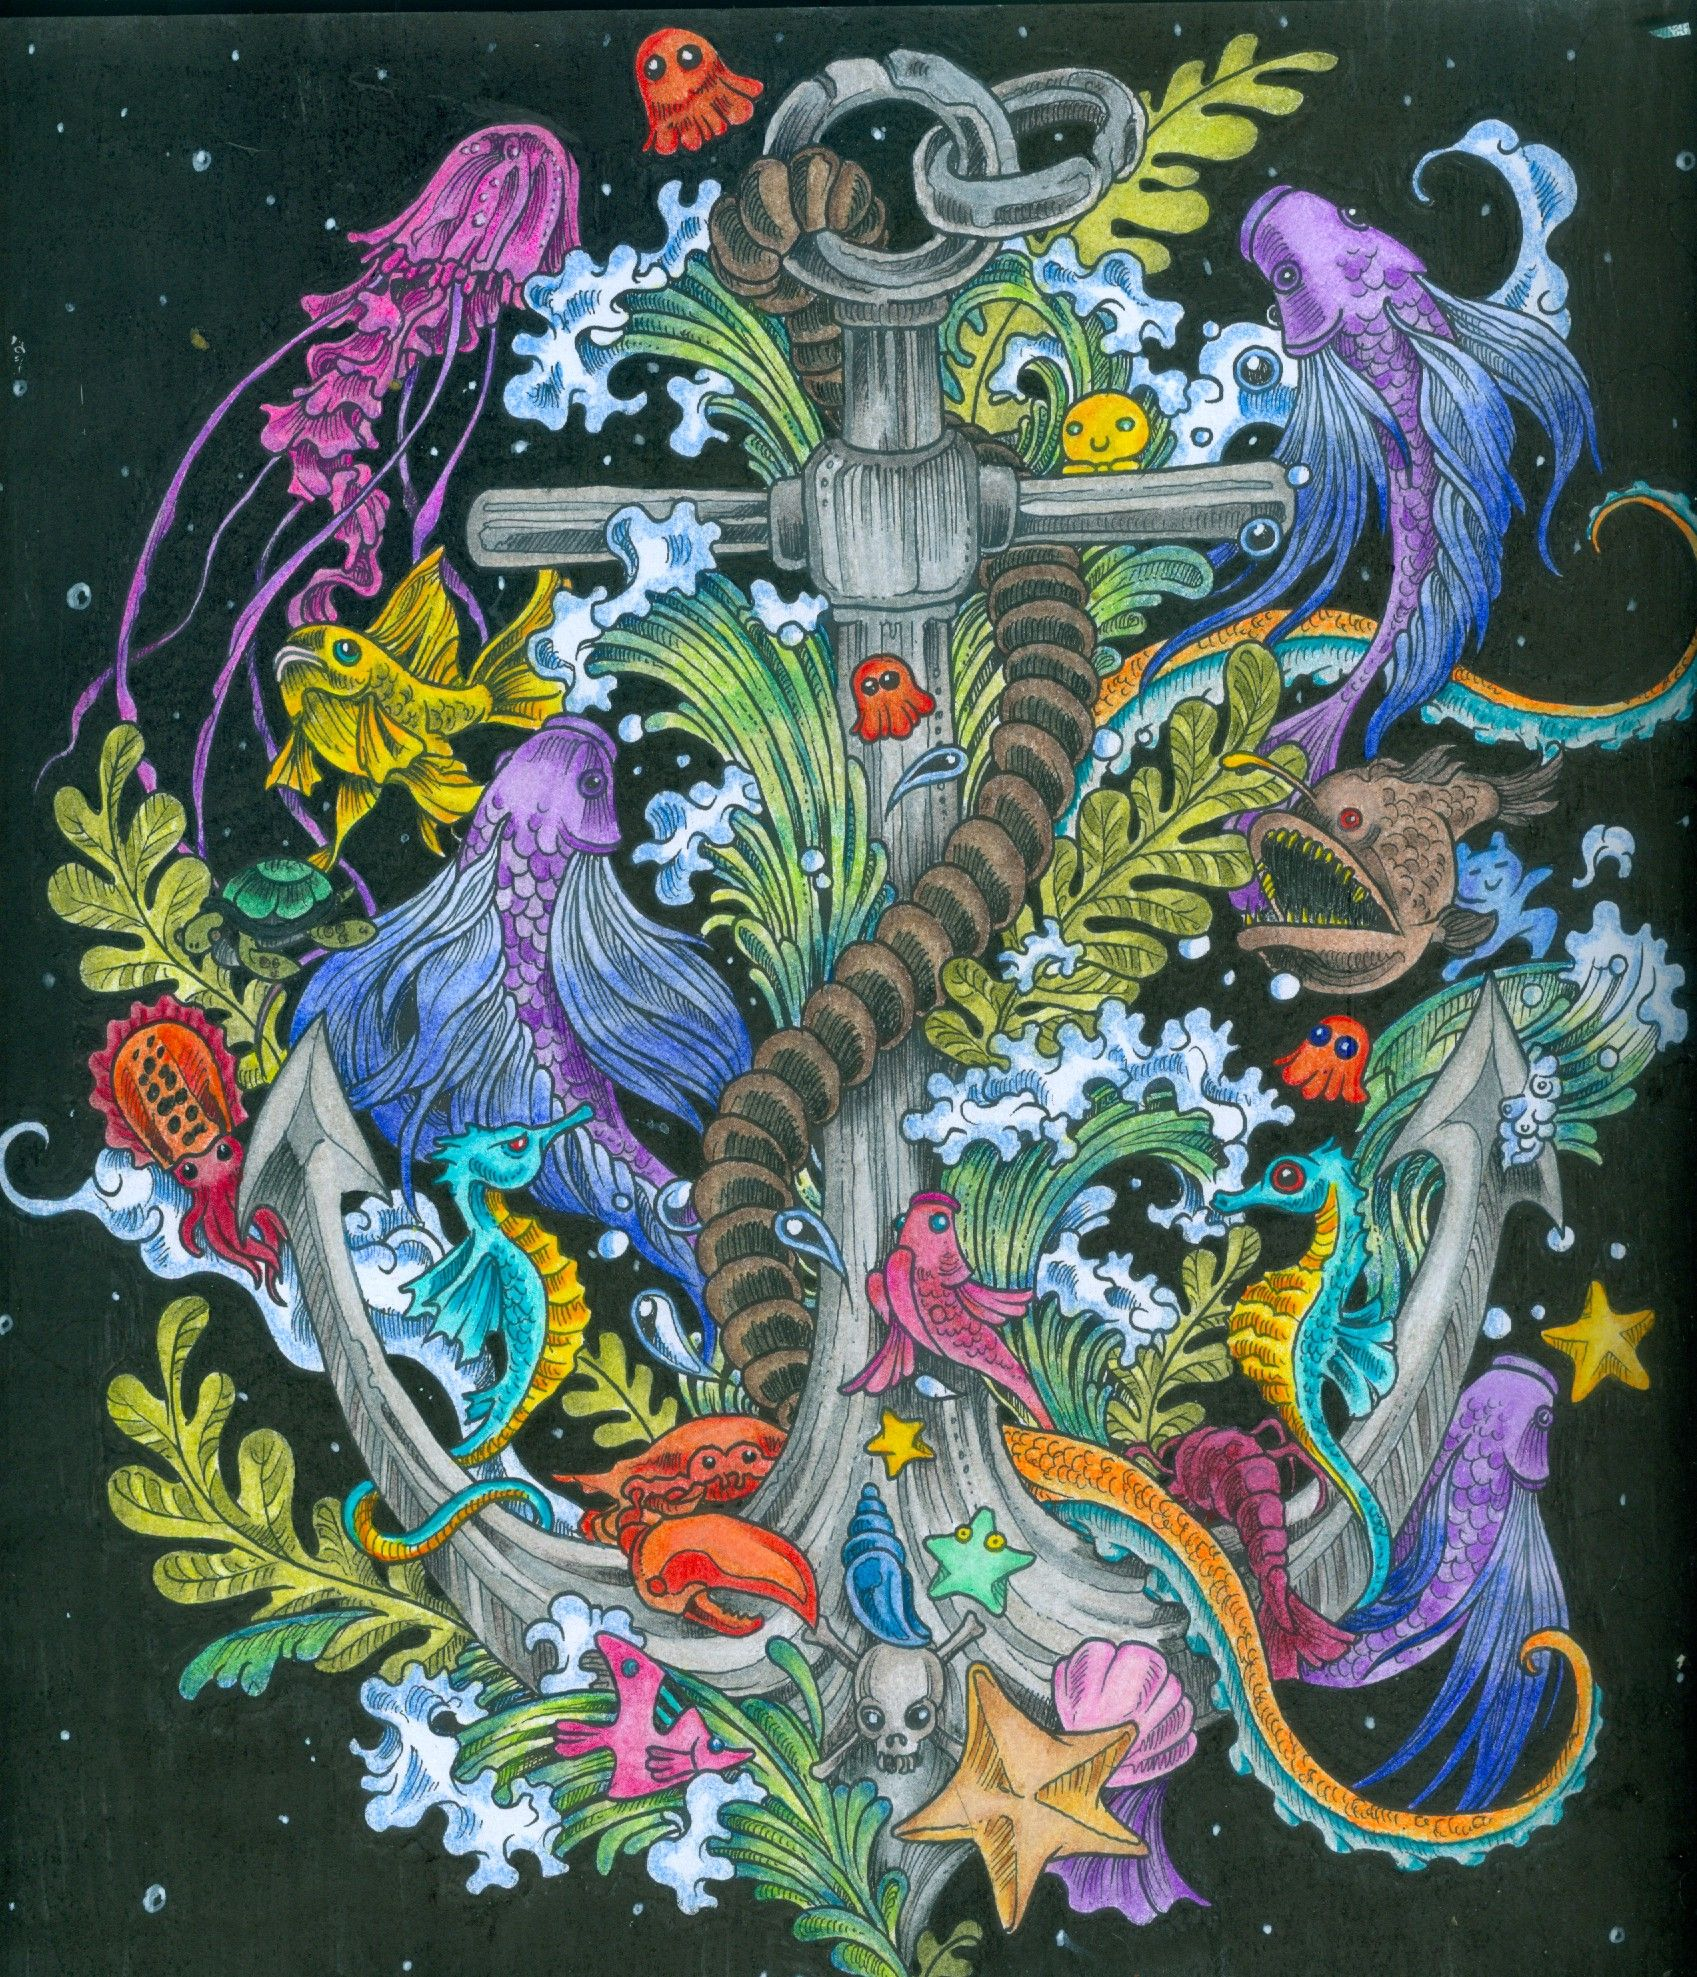 From Kerby Rosanes Imagimorphia Coloring Book Art Enchanted Forest Coloring Book Coloring Books